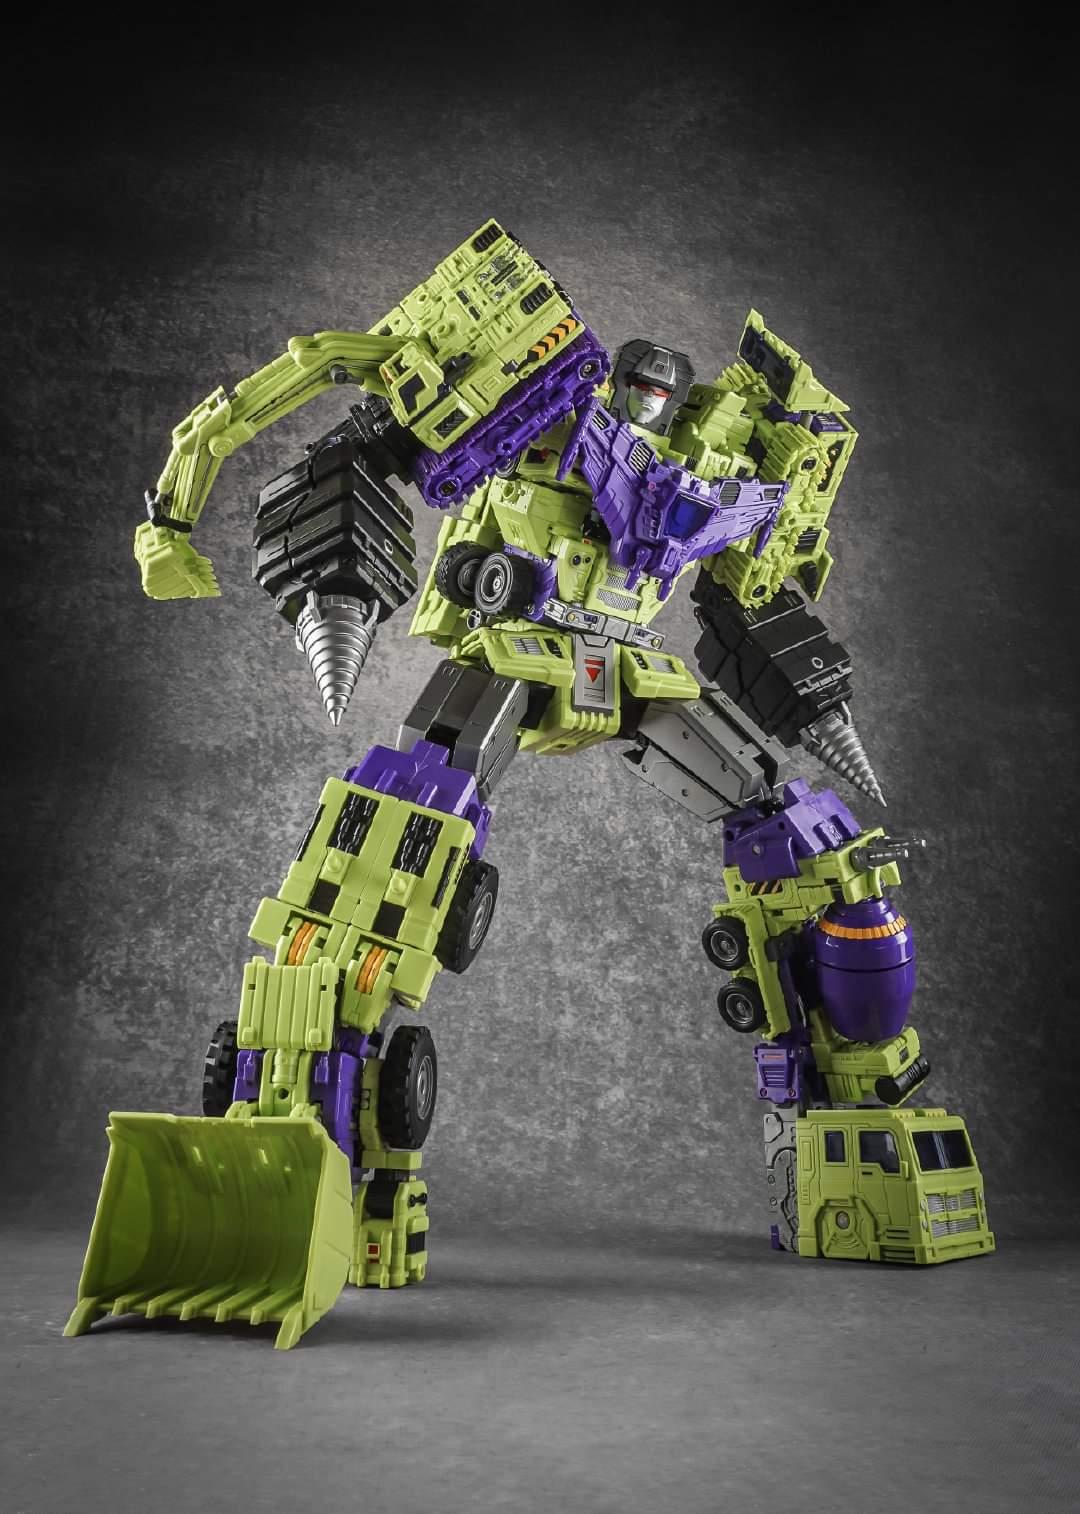 [Toyworld] Produit Tiers - Jouet TW-C Constructor aka Devastator/Dévastateur (Version vert G1 et jaune G2) - Page 10 PVKEtami_o